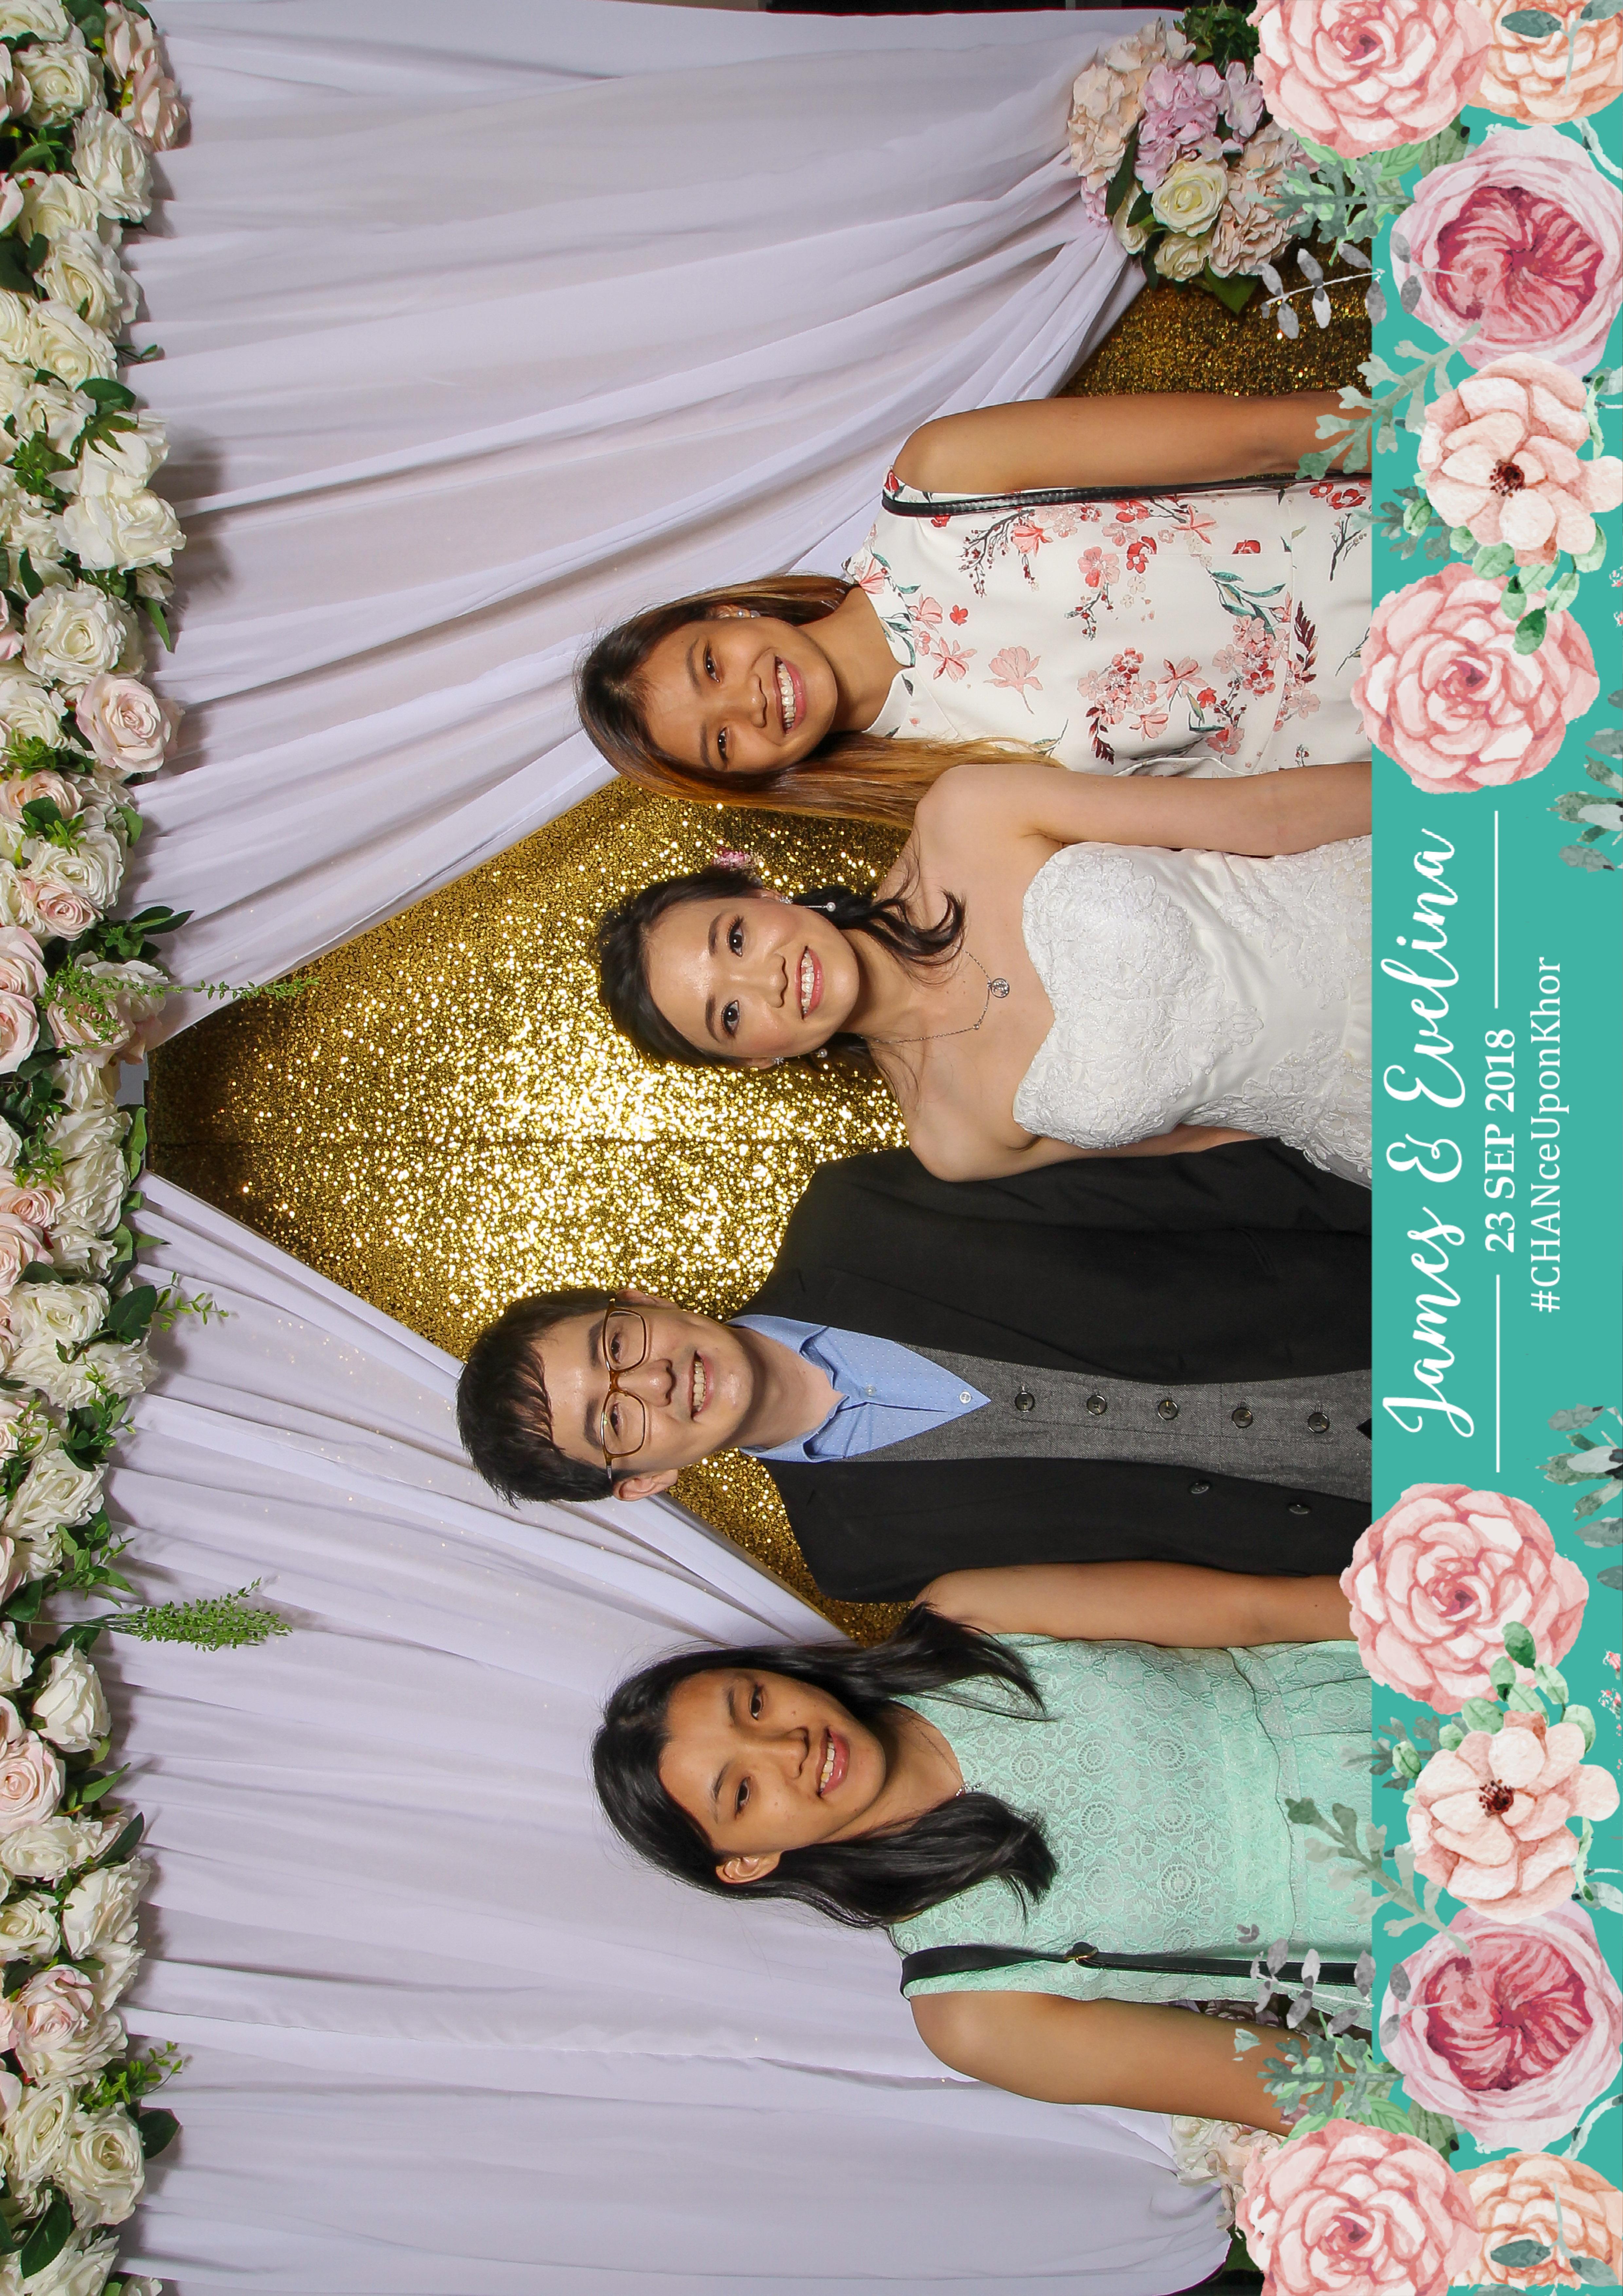 wedding photo booth singapore-14